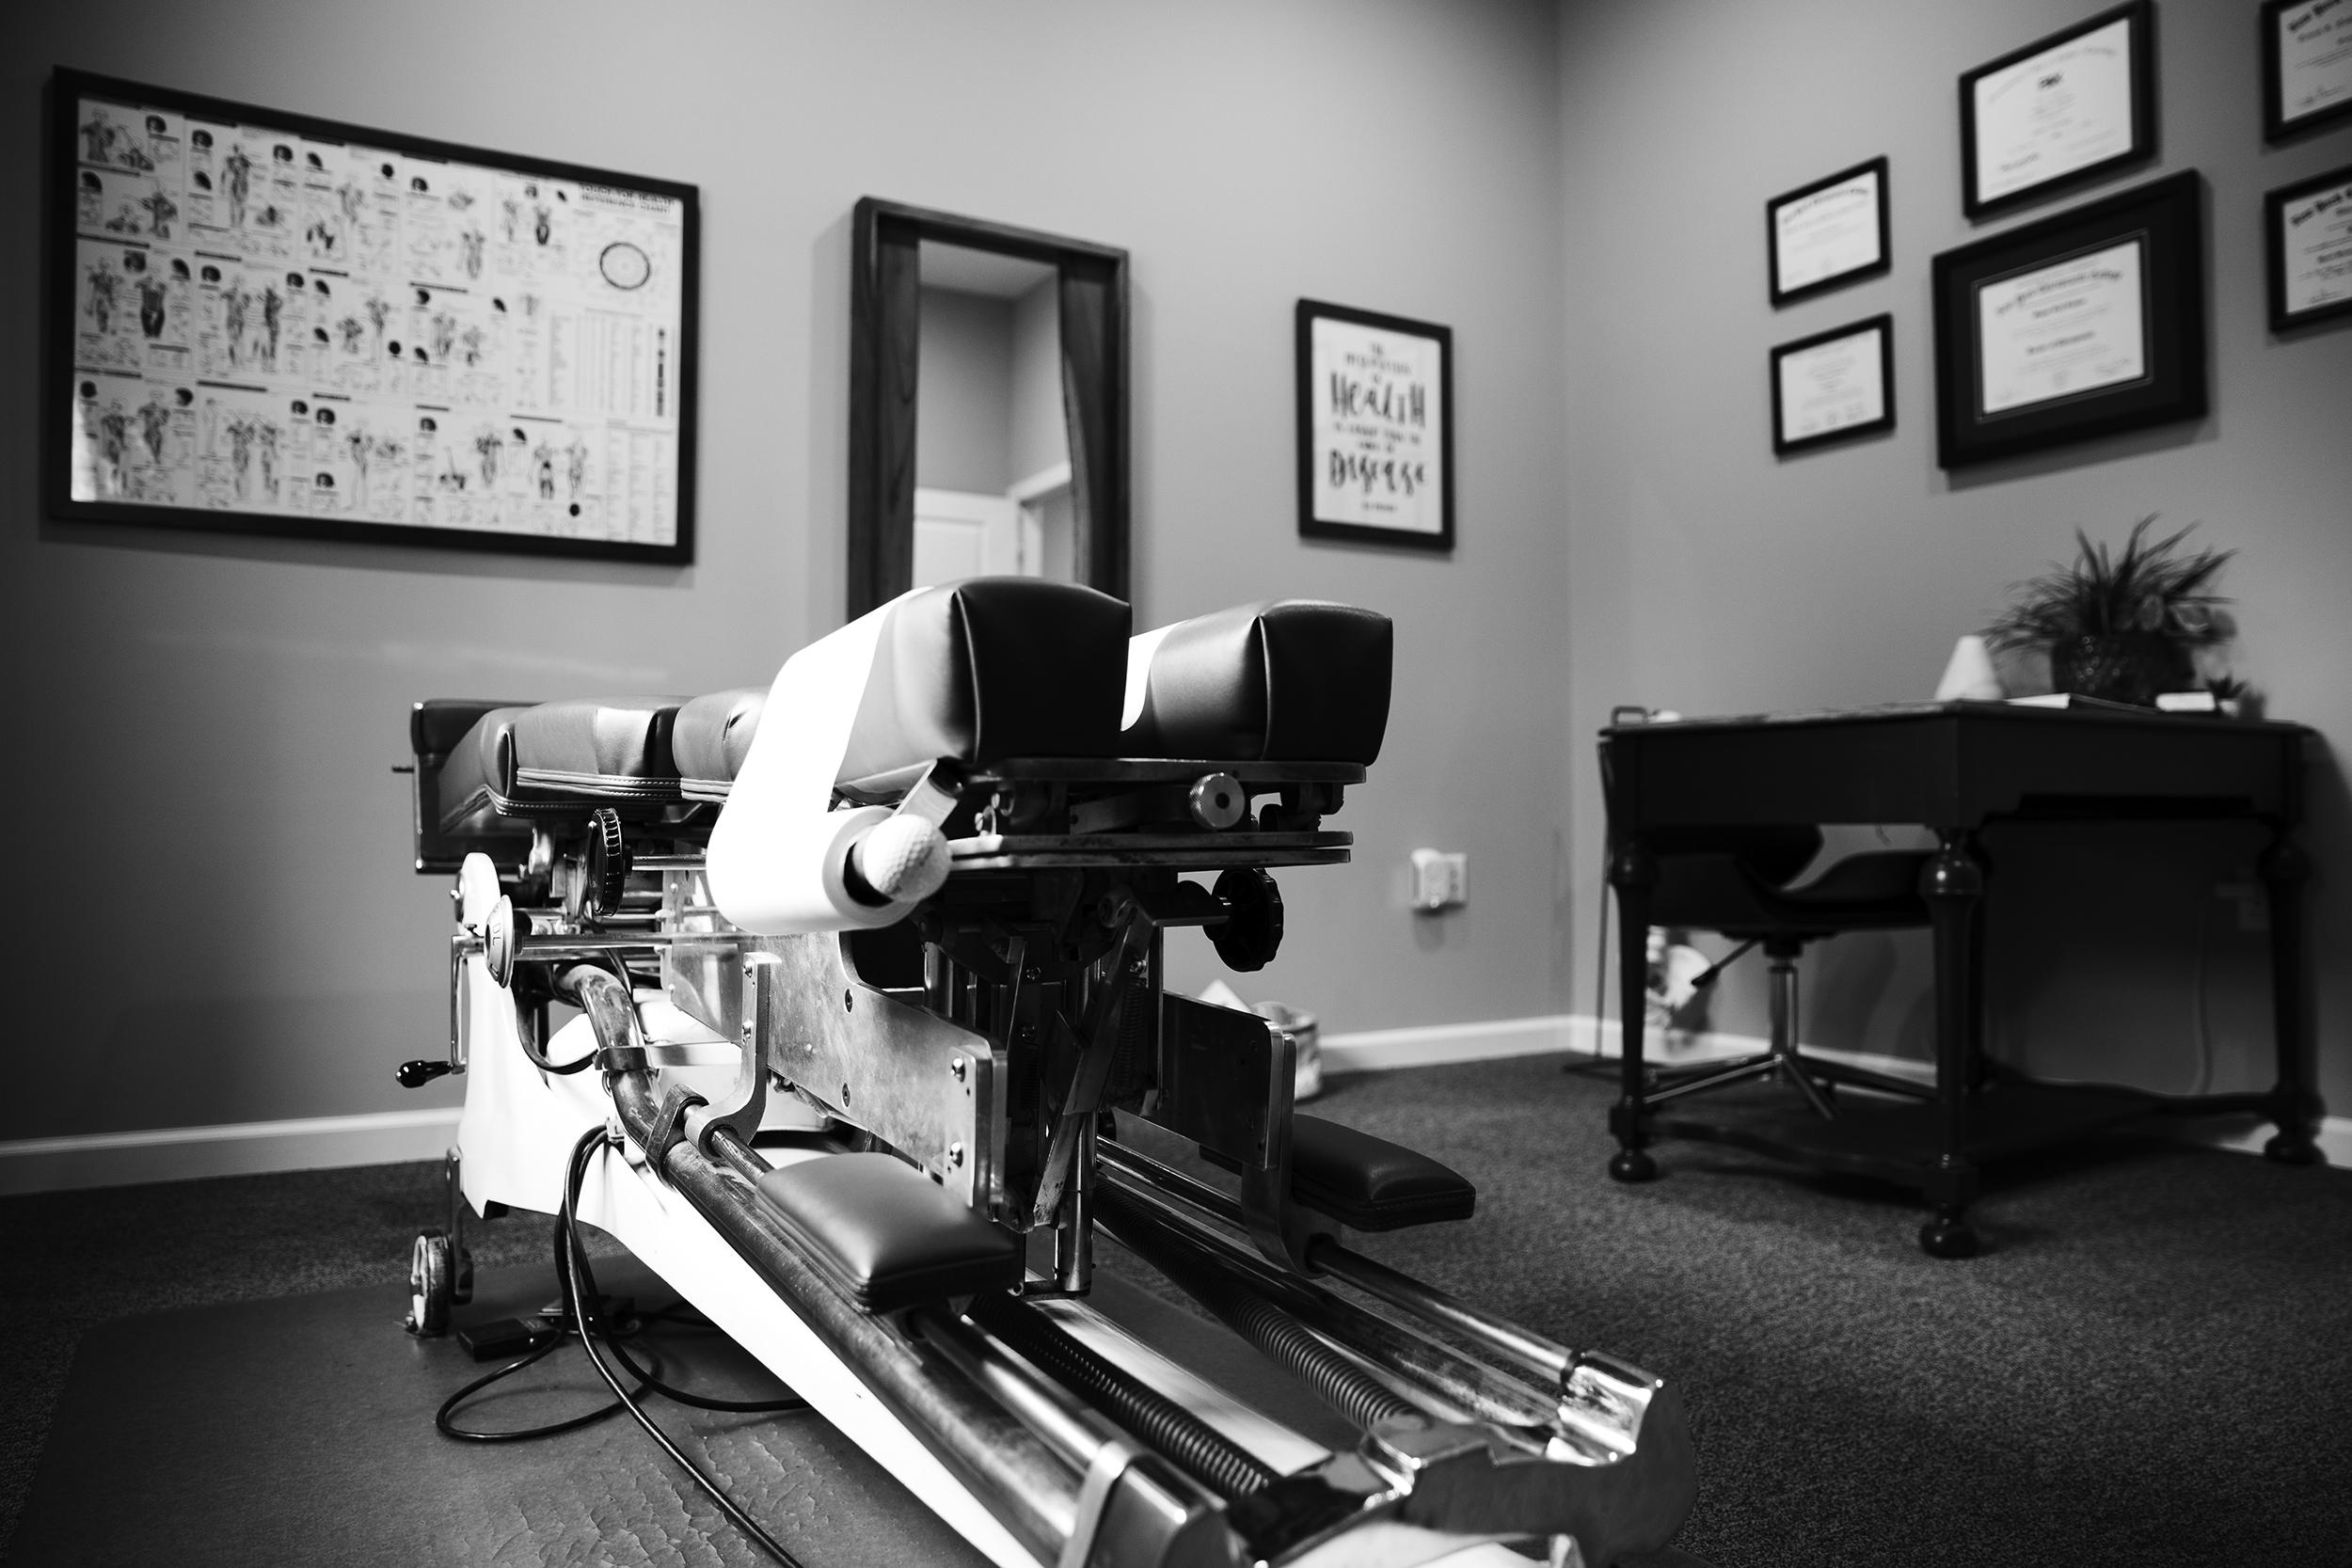 chiropractic-office-erin-cunningham-business-photographer-canandaigua-new-york.jpg